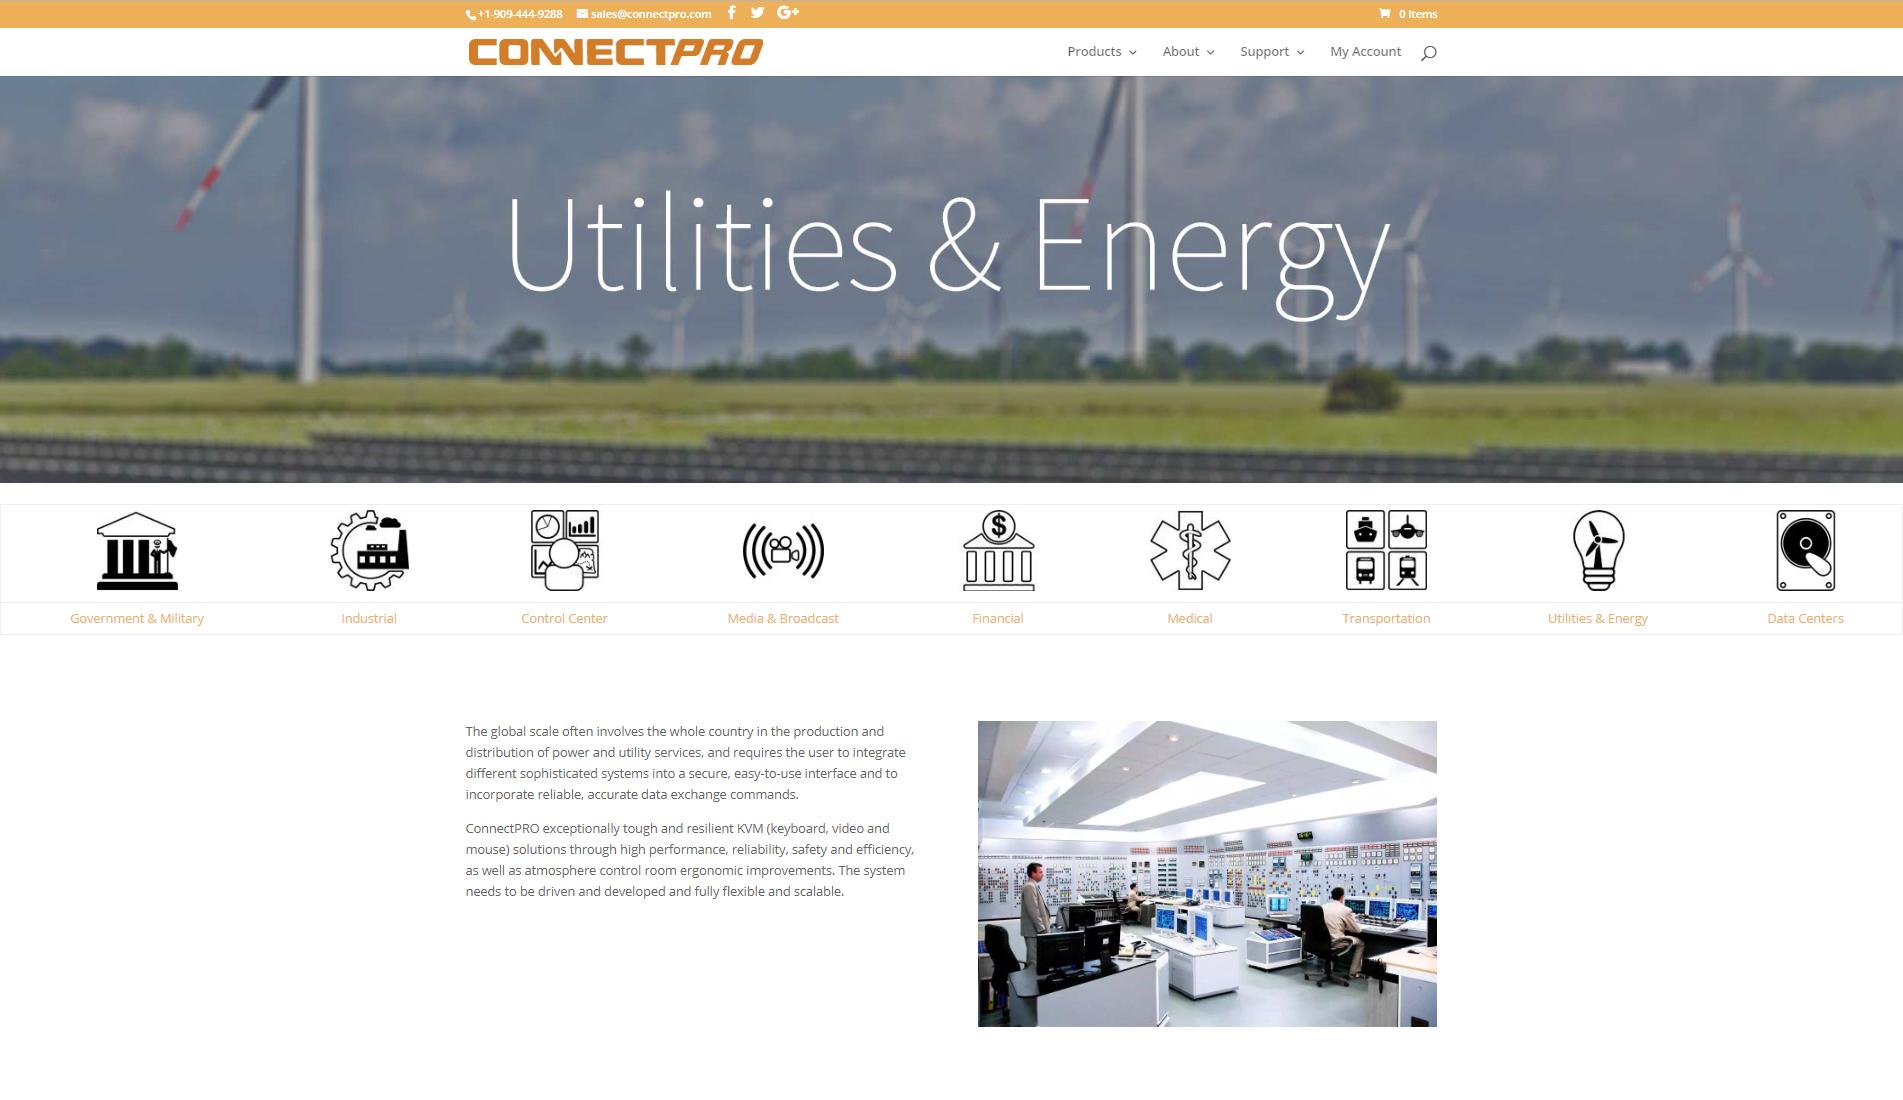 ConnectPRO_Industry_Nav_Bar_utilities_energy.jpg